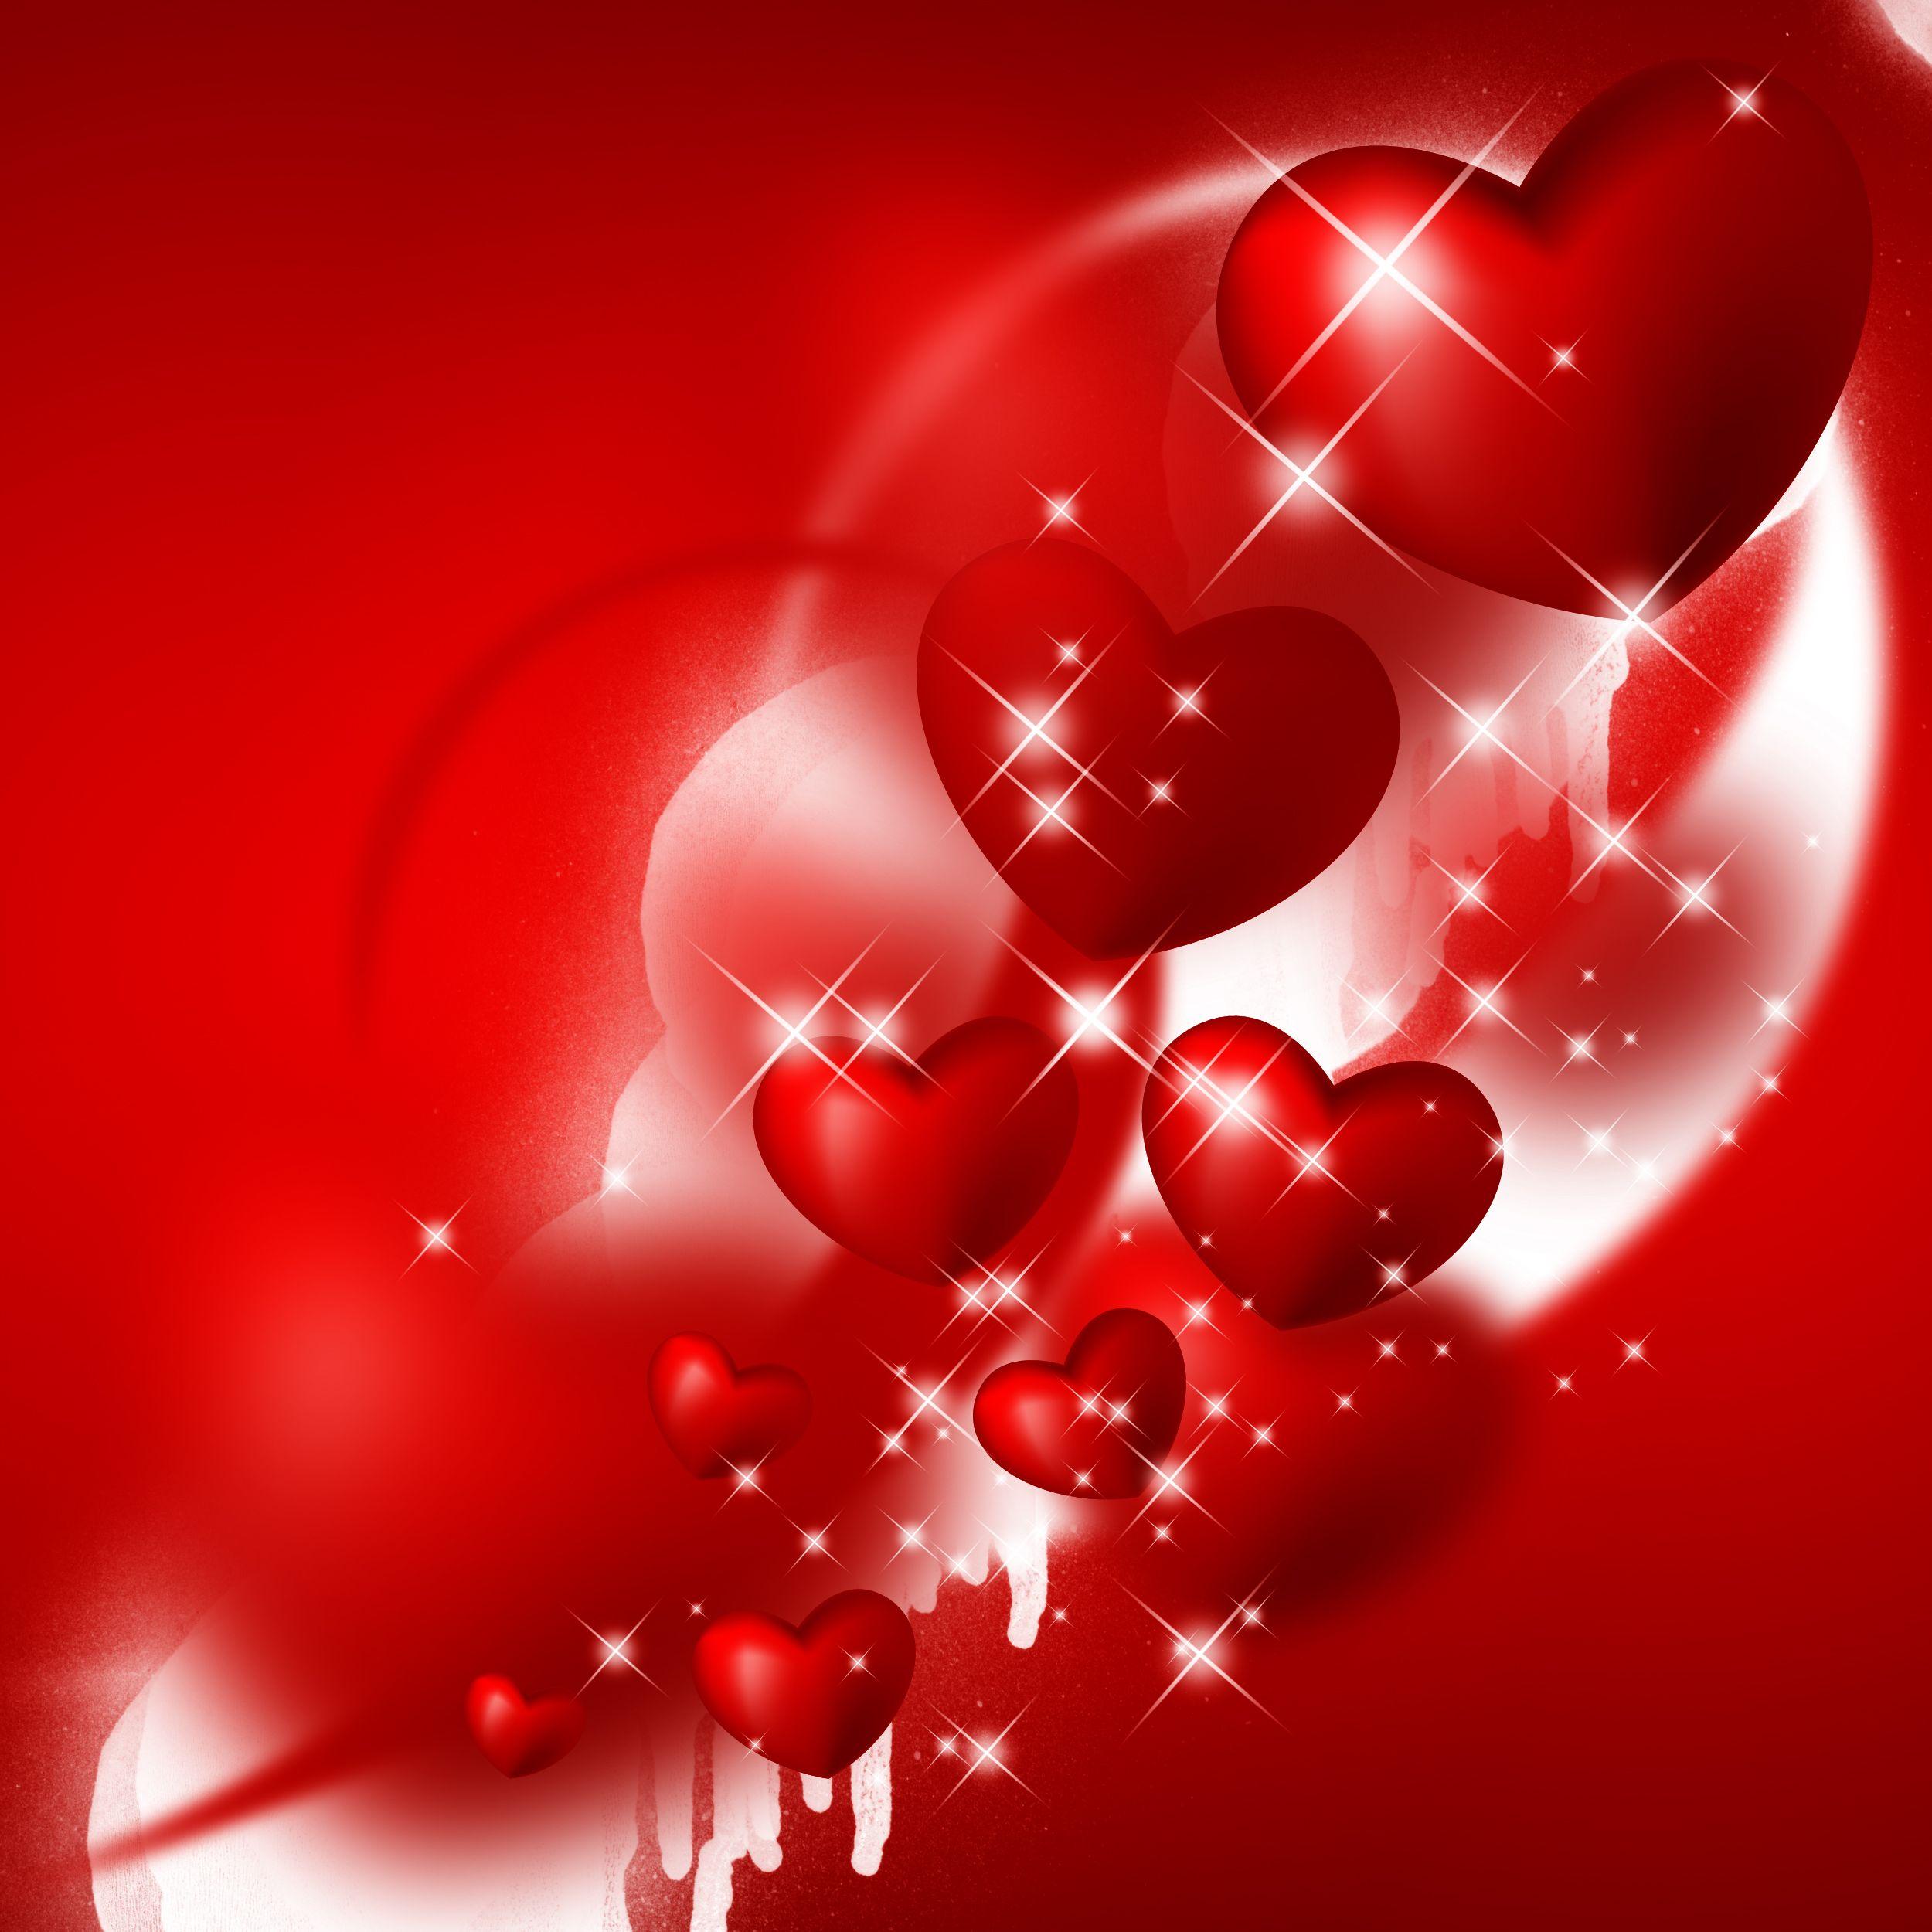 Valentines Day Wallpaper: Valentine 2015 Background Wallpapers